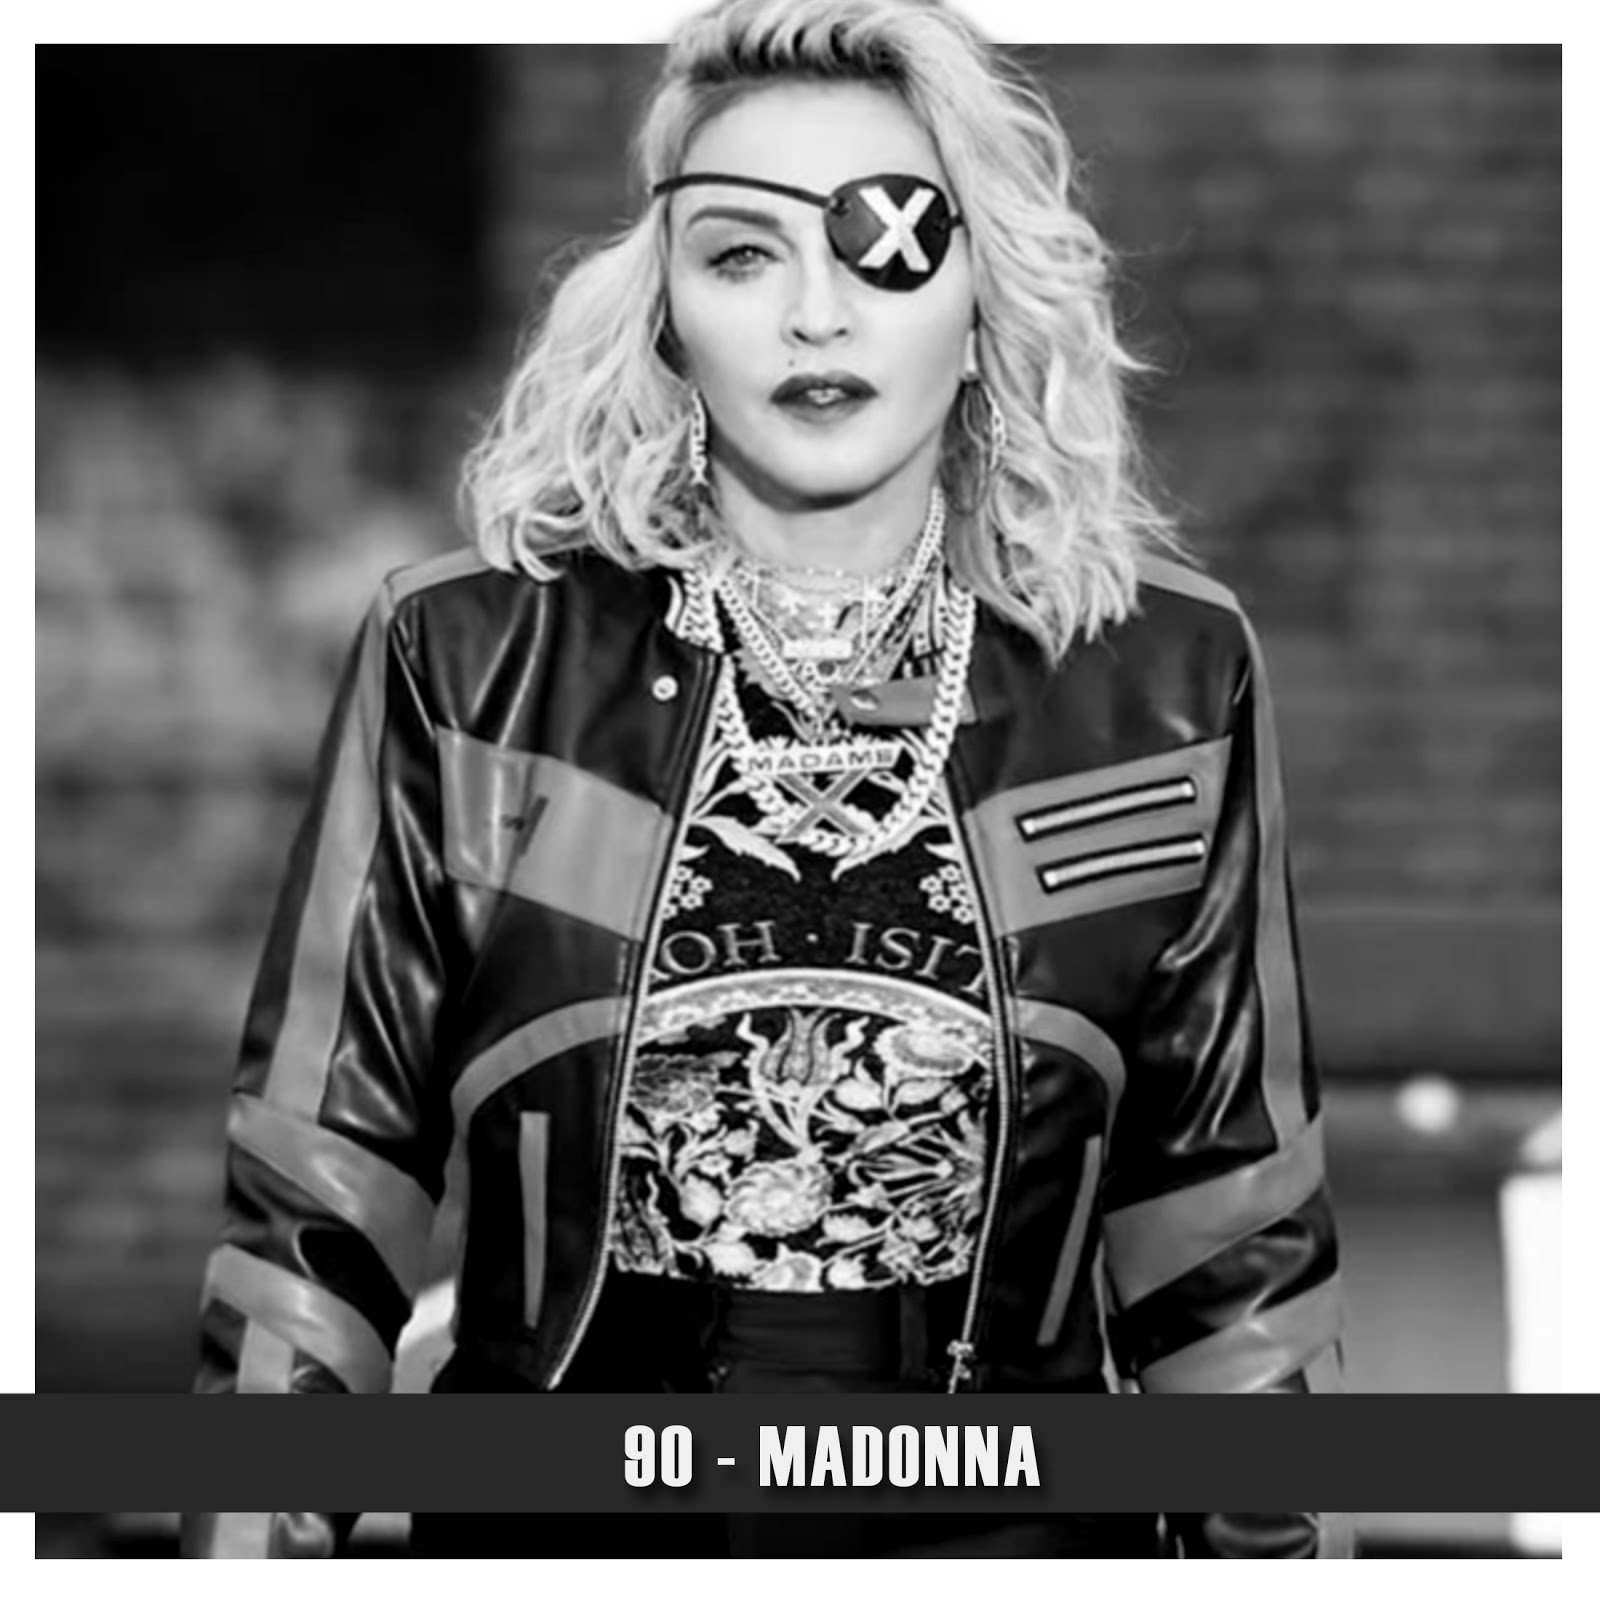 Doublecast 90 - Madonna